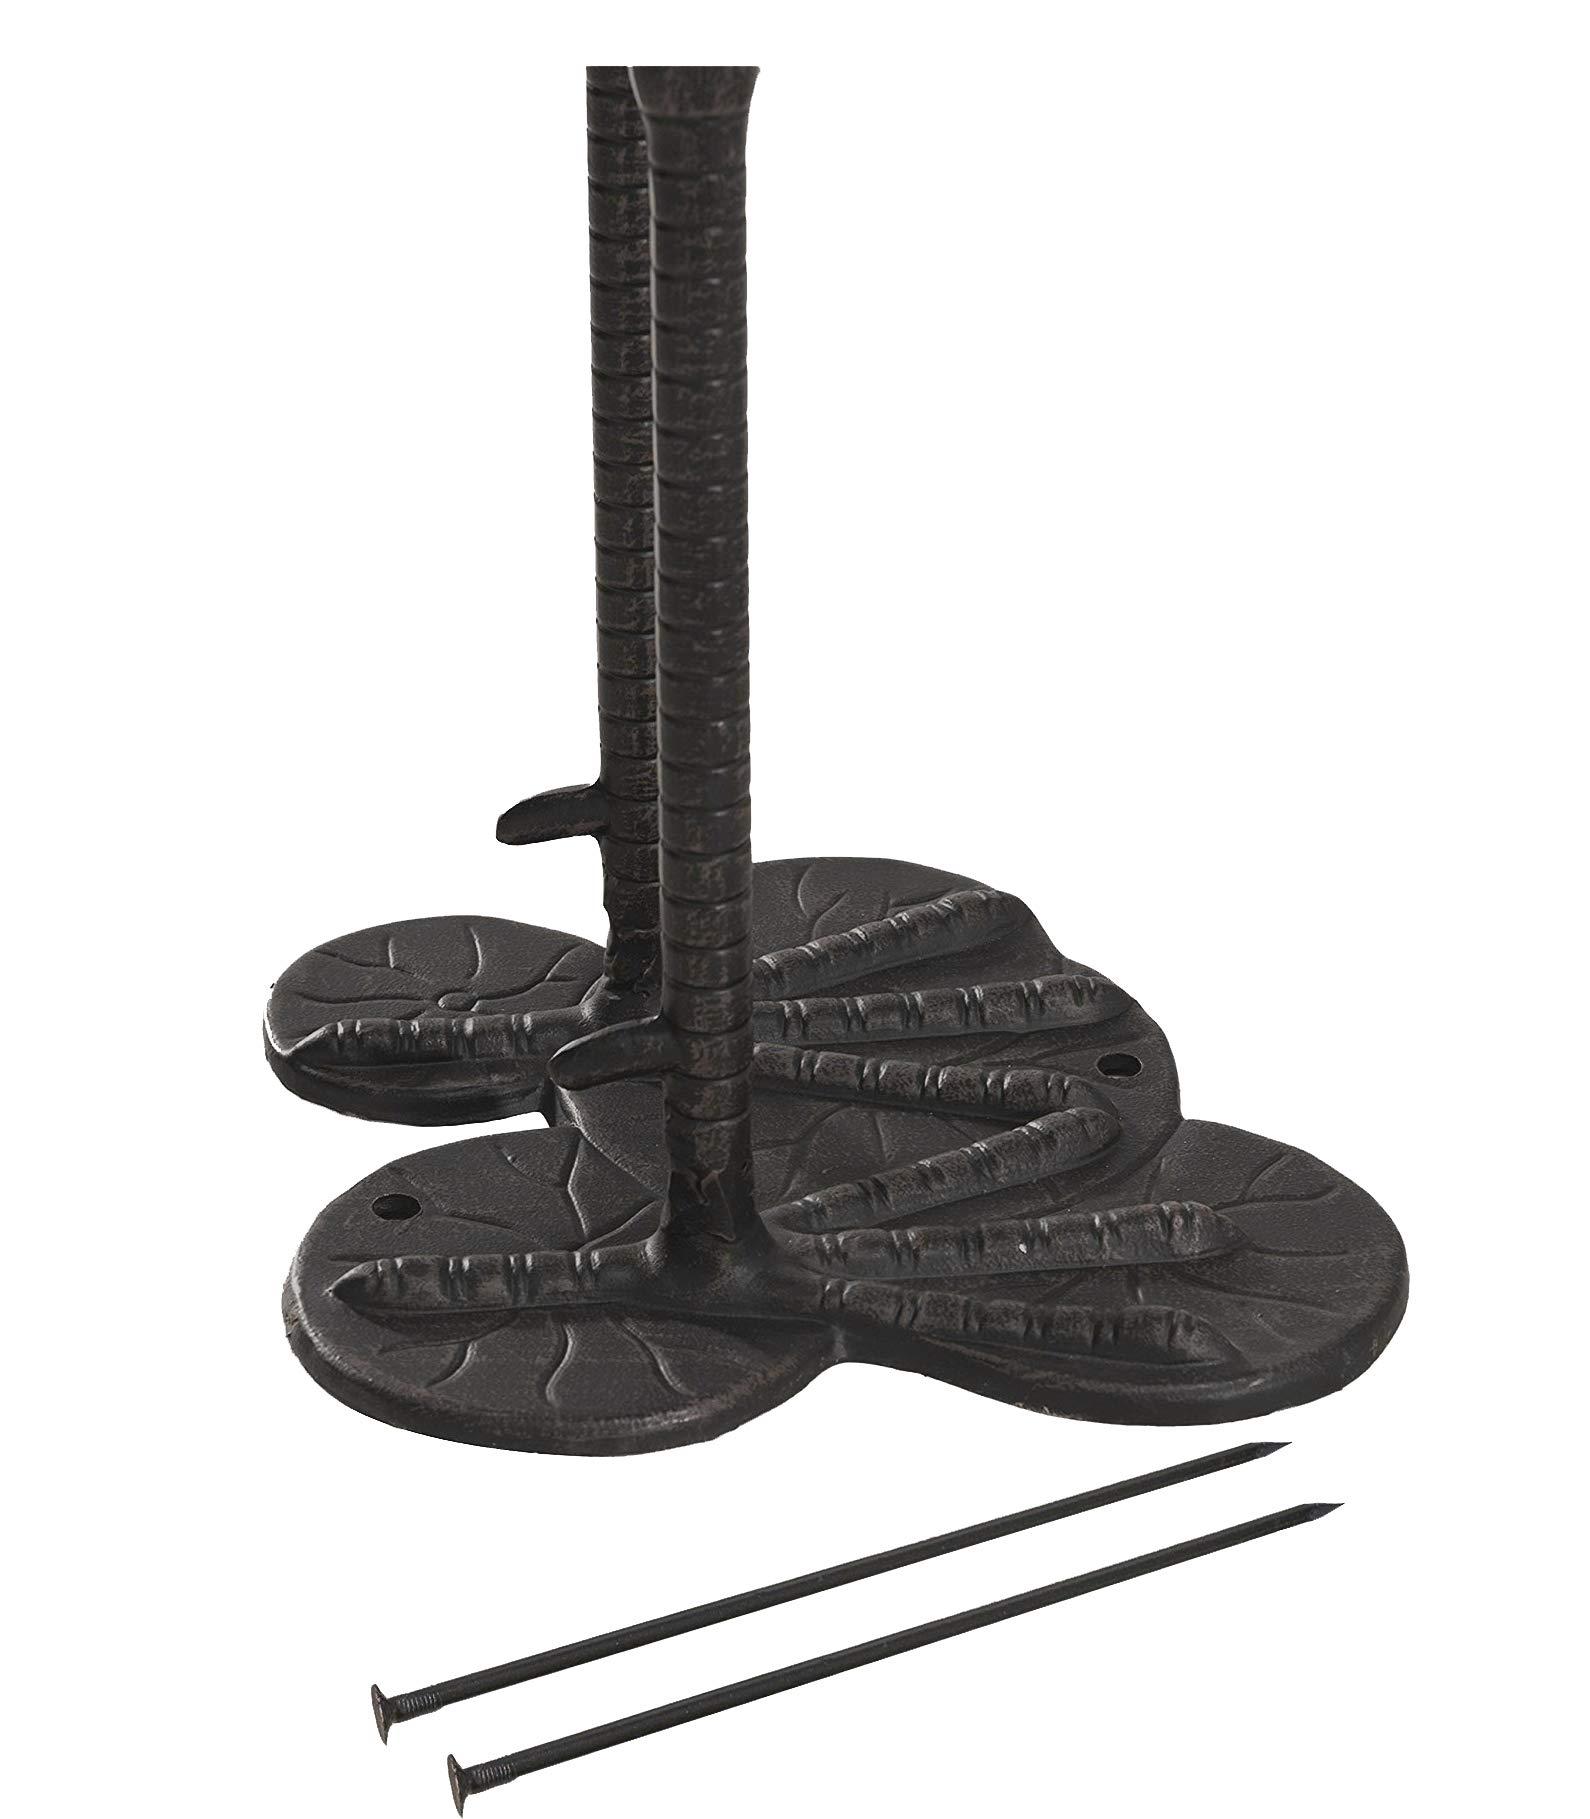 Metal Cranes for Yard Garden Sculpture Pair Statue - Upright and Preening Standing Crane Heron Couple Sculpture Set, Matt Black by PierSurplus (Image #6)